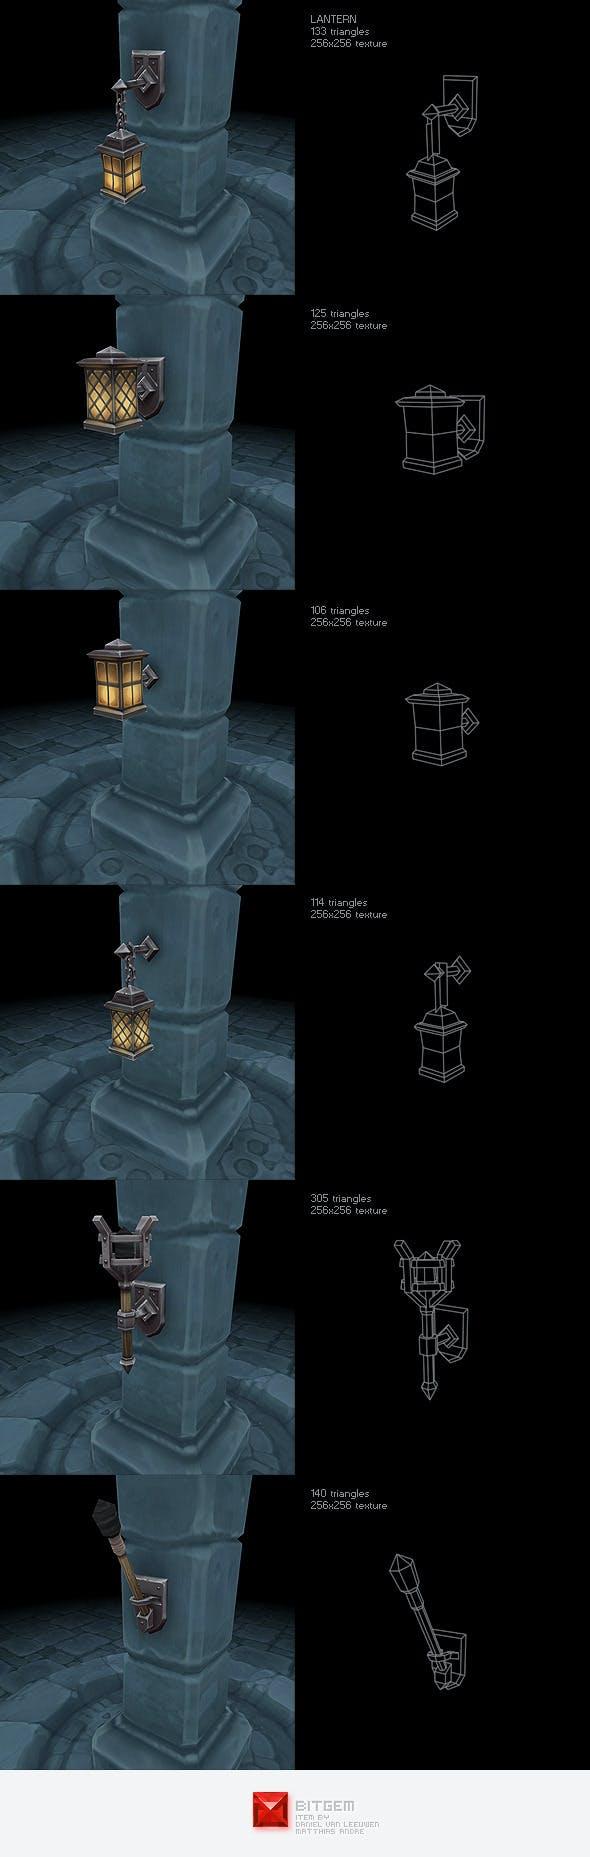 Low Poly Lantern Set - 3DOcean Item for Sale